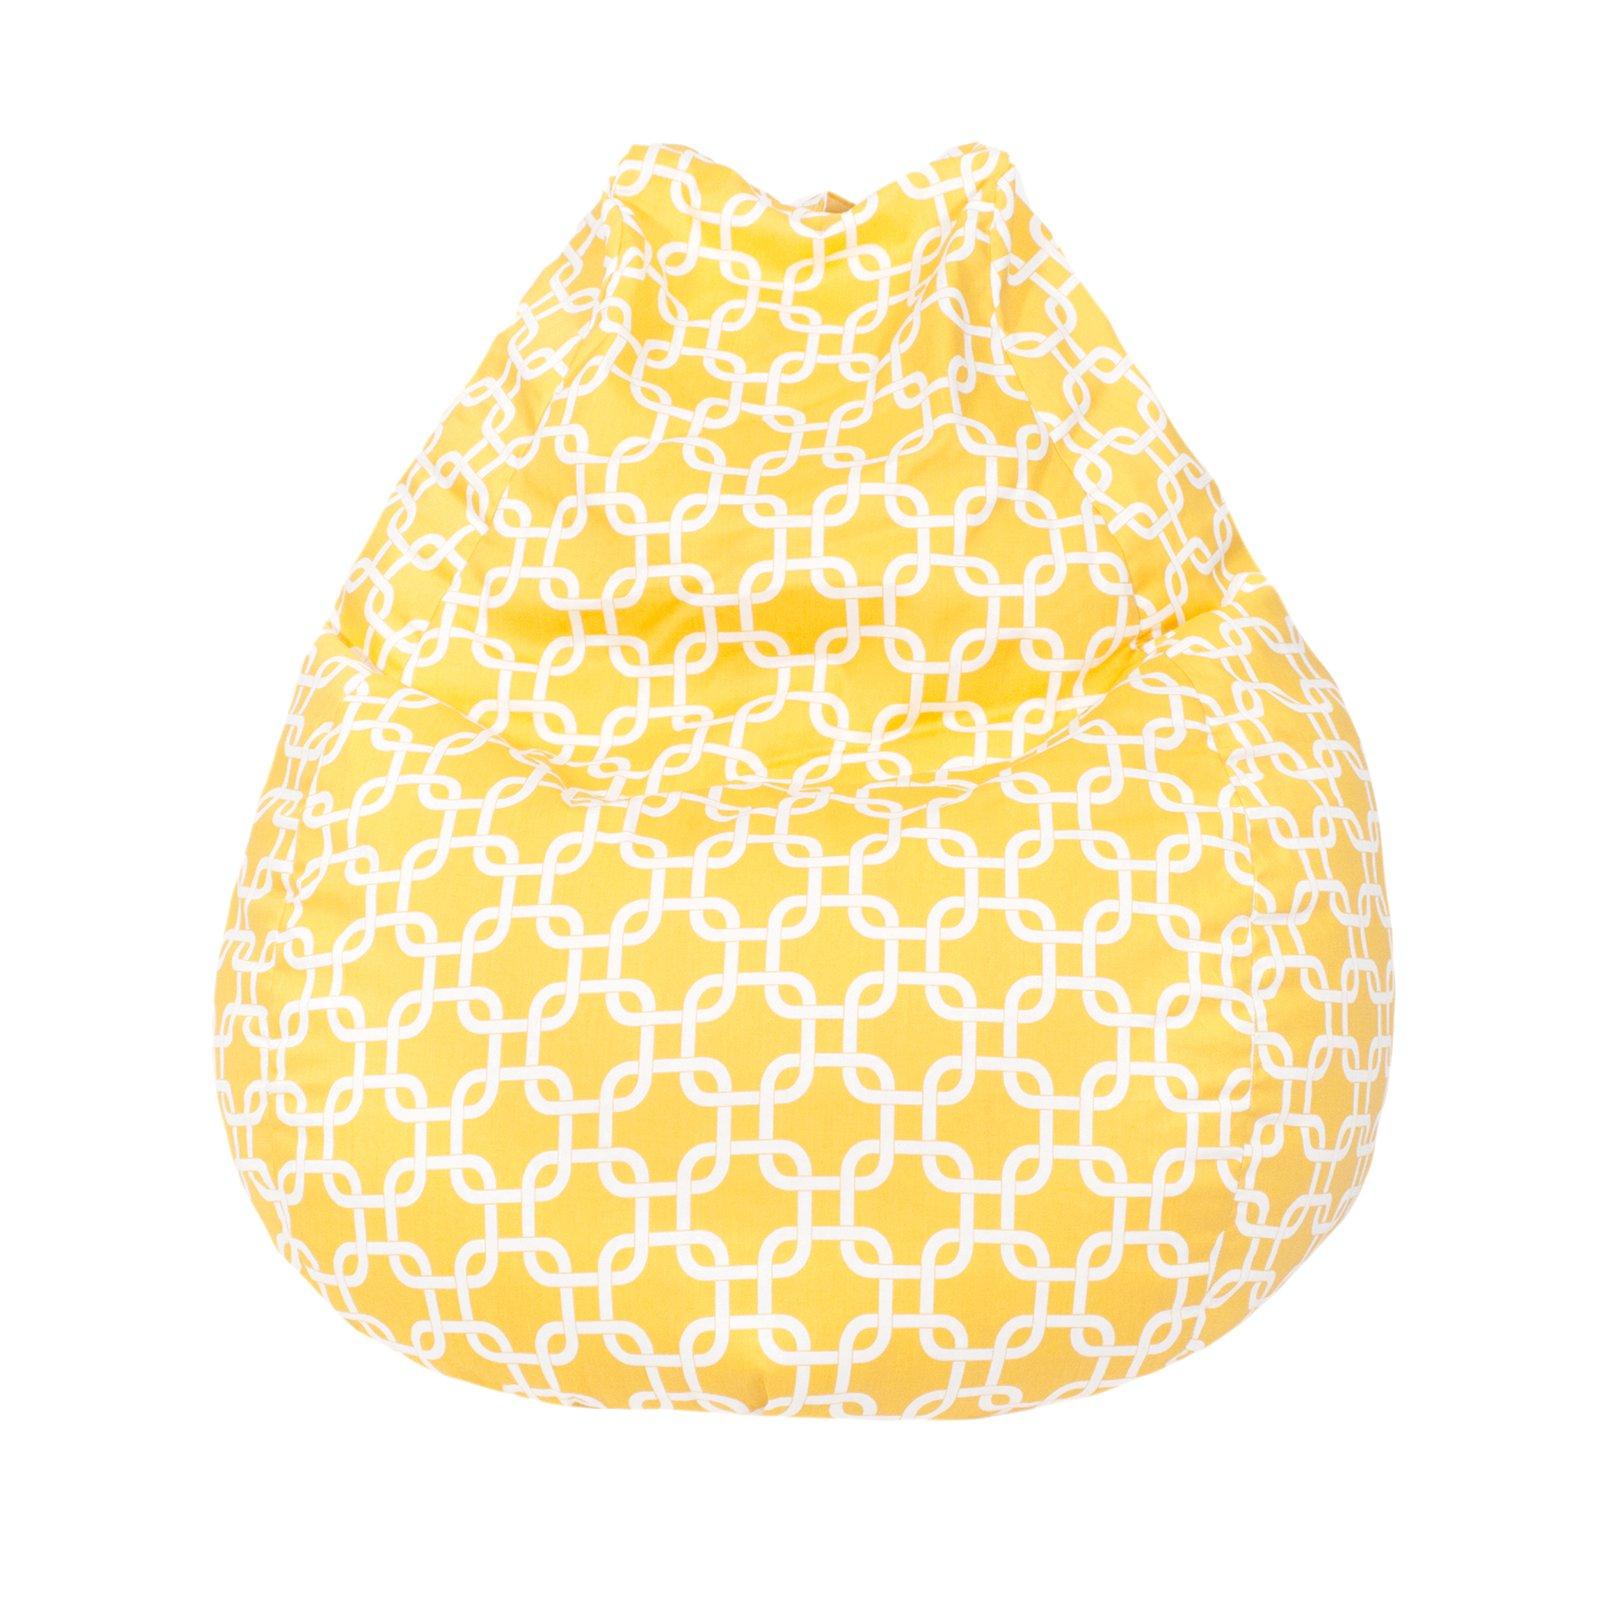 Awesome Gold Medal Gotcha Hatch Pattern Large Teardrop Bean Bag Ibusinesslaw Wood Chair Design Ideas Ibusinesslaworg